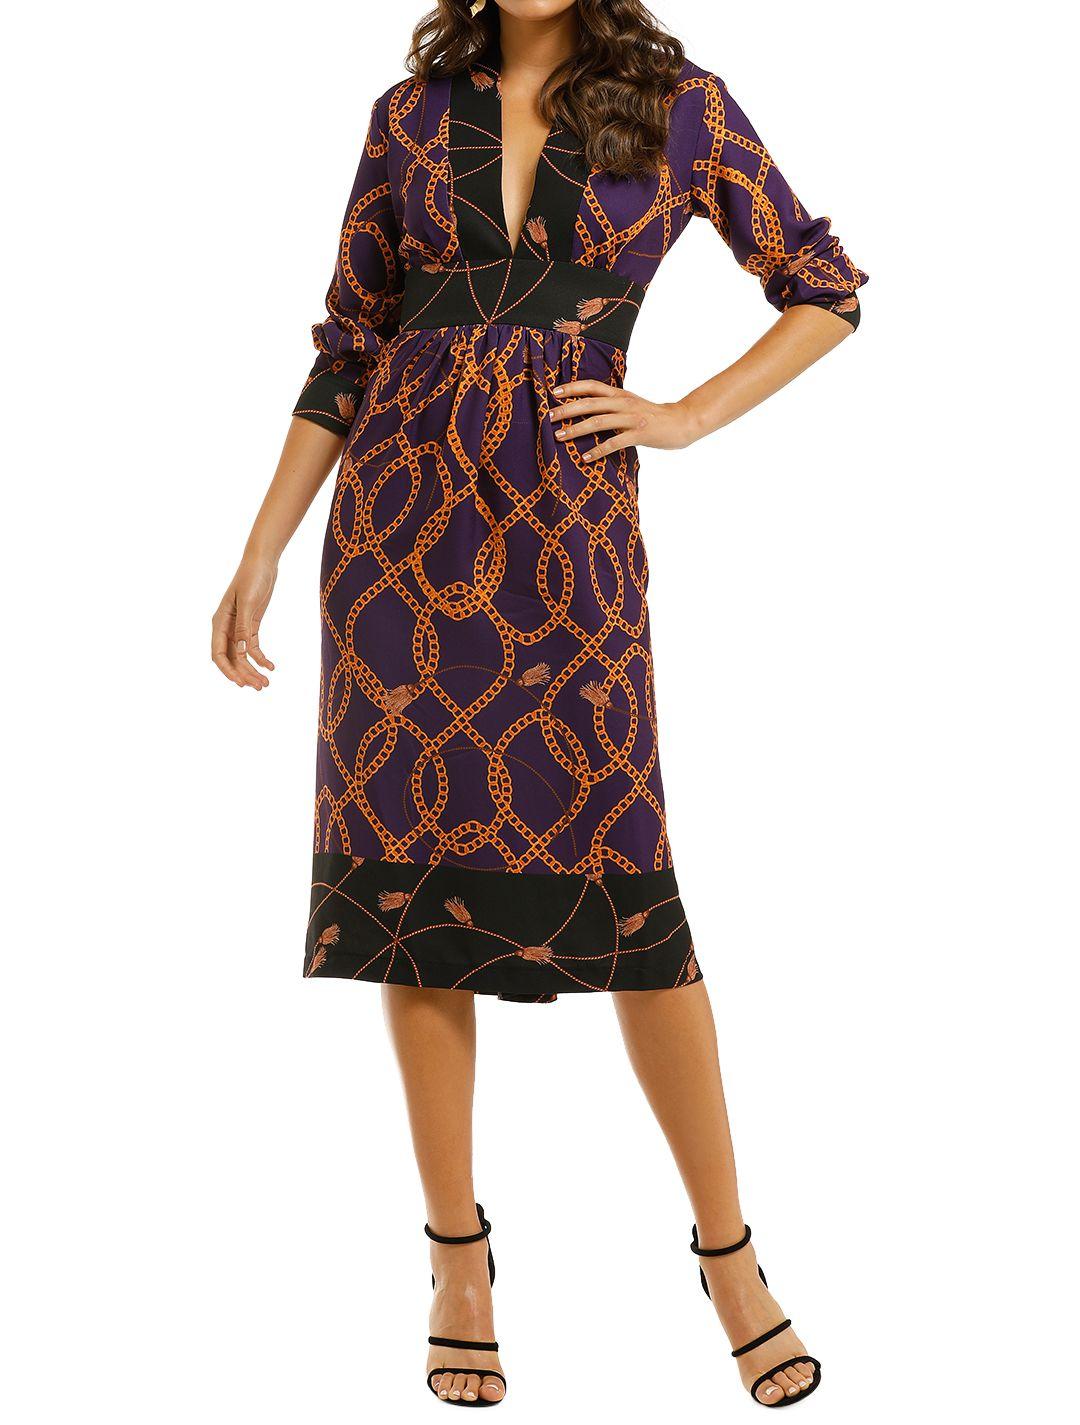 Alexia-Admor-Brielle-V-Neck-LS-Dress-Front